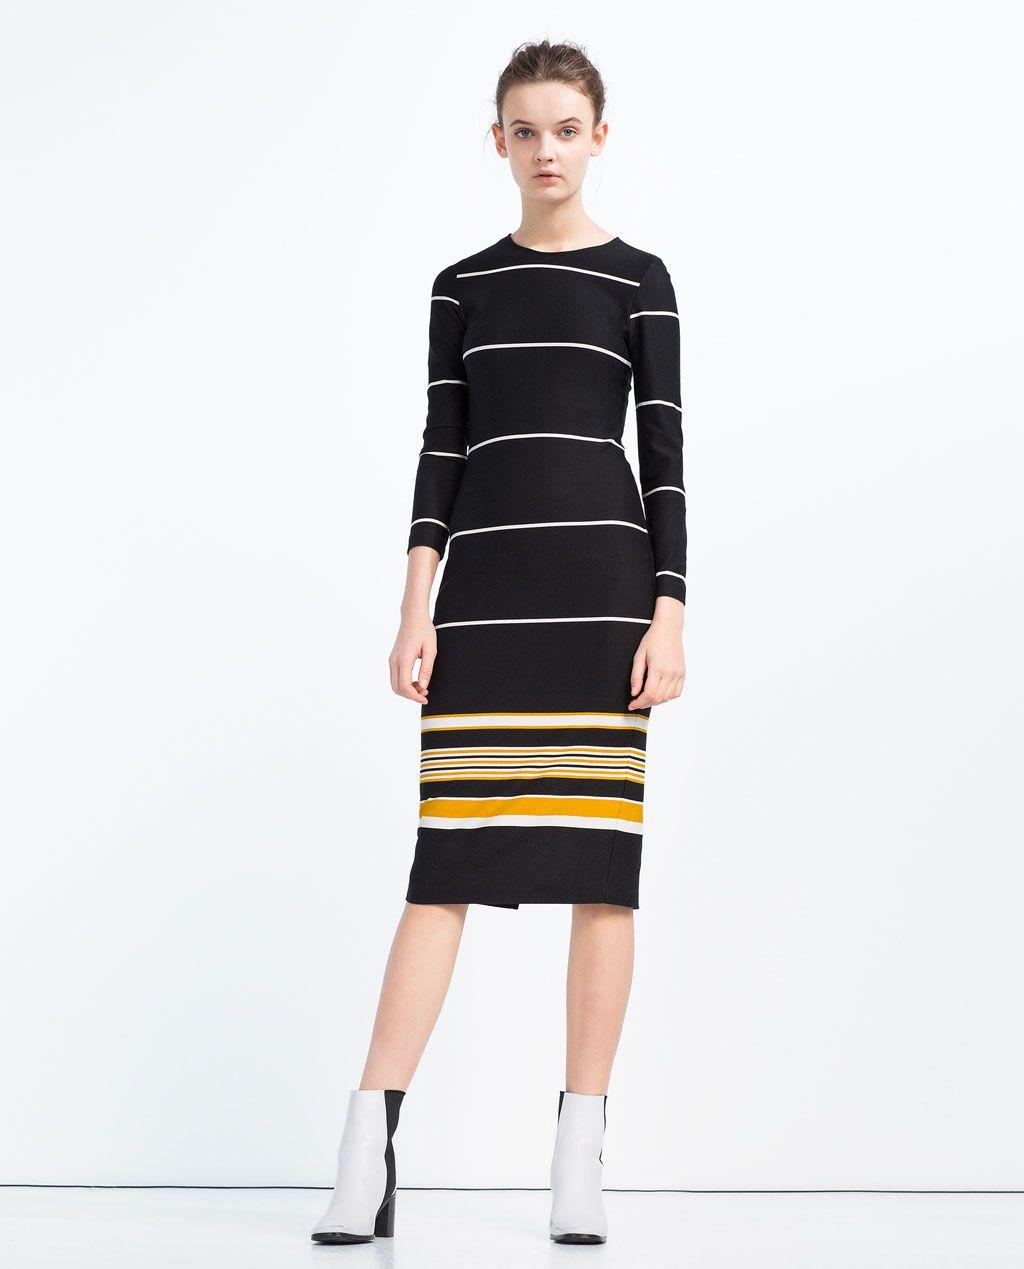 Af Billede Fashion Modetøj Vestito Kjole A Fra 1 Stribet Zara 66vxqrg5w